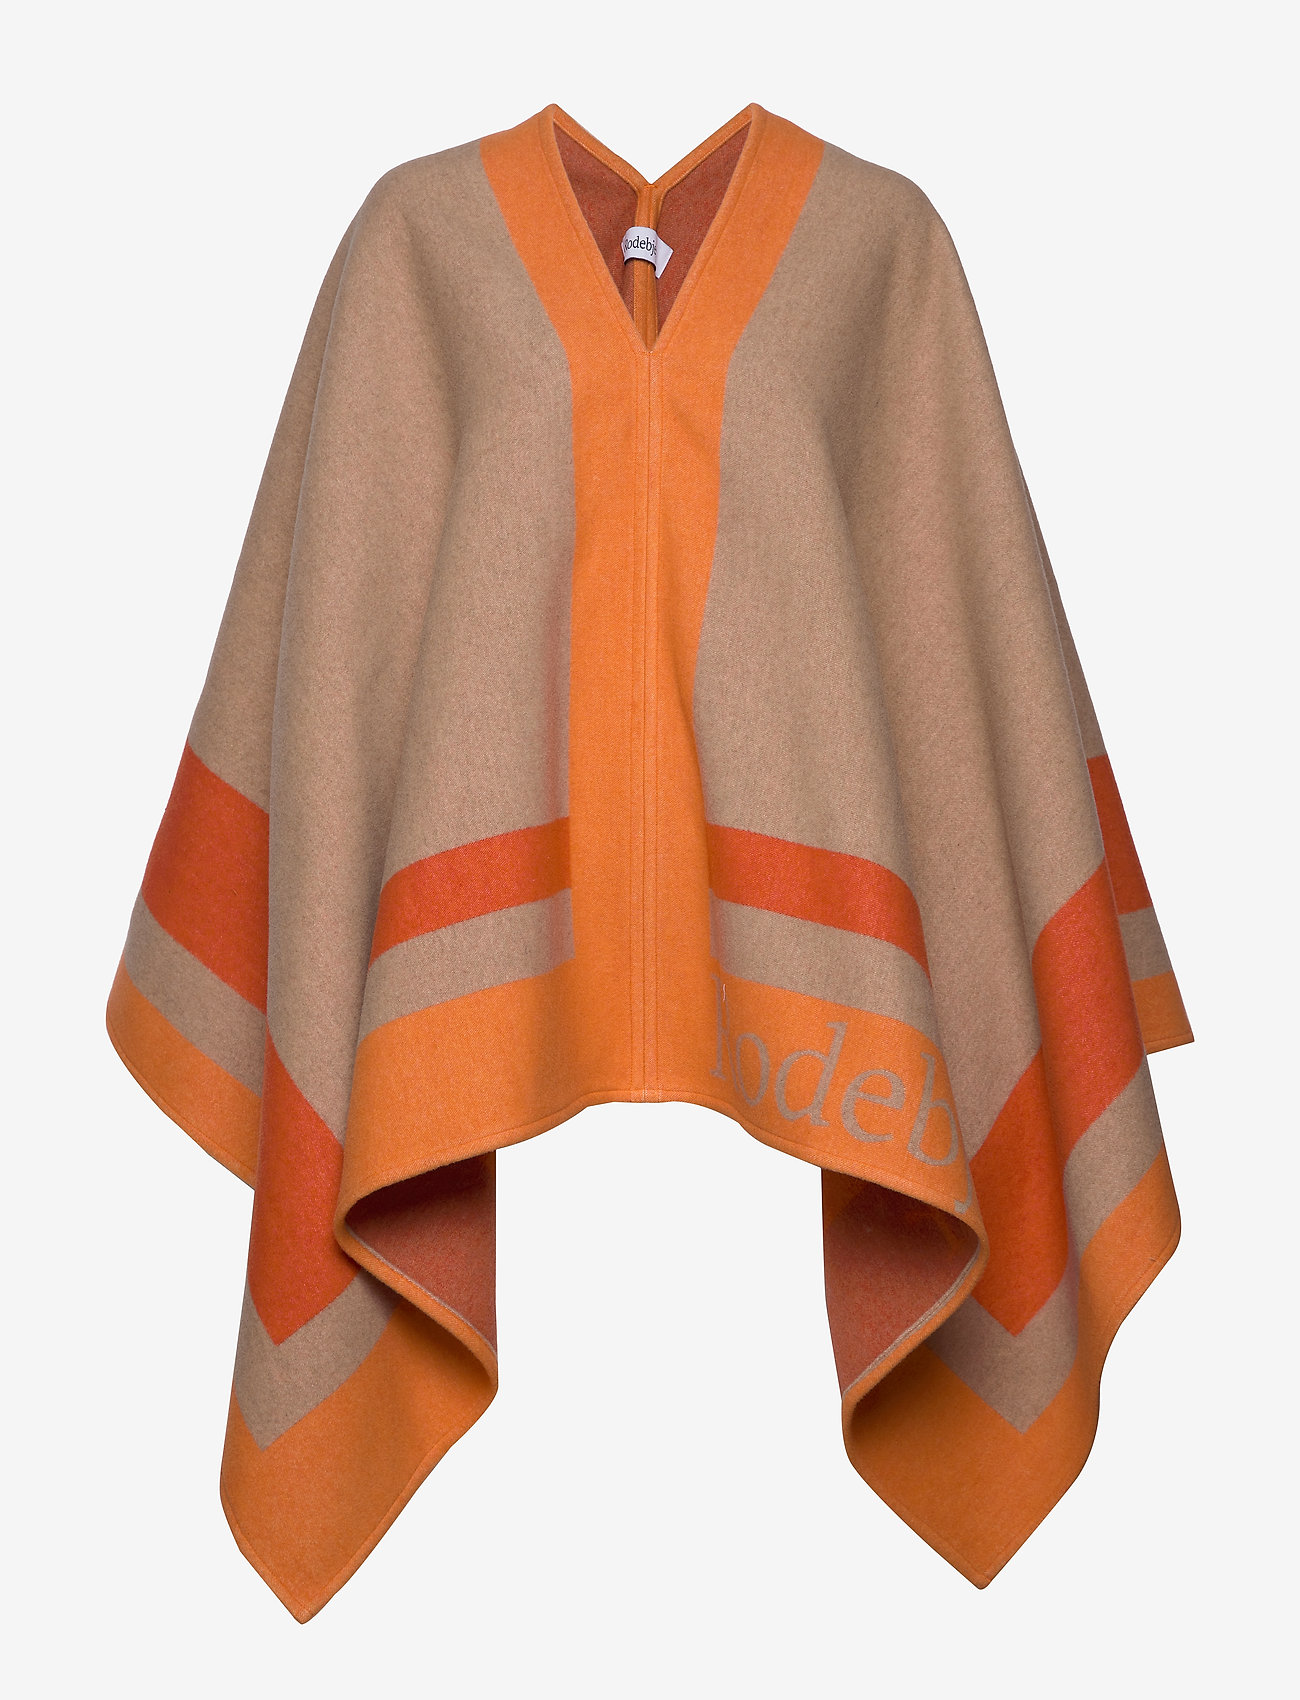 RODEBJER - RODEBJER VARCA - ponchos & capes - camel - 0